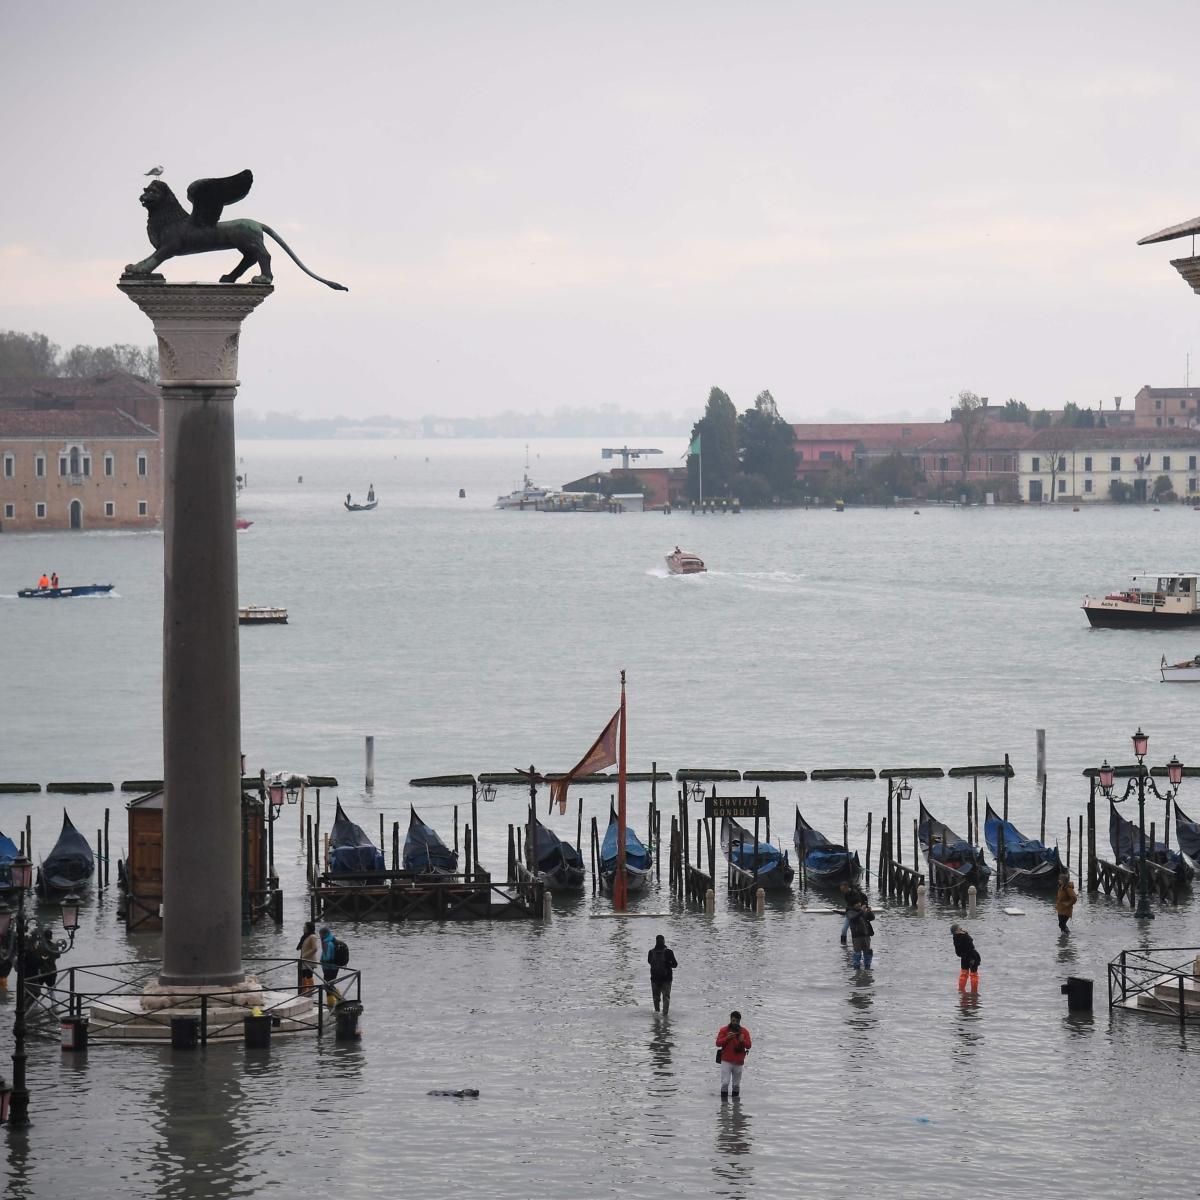 Venice floods: Mayor Luigi Brugnaro blames Climate change for the High Tides